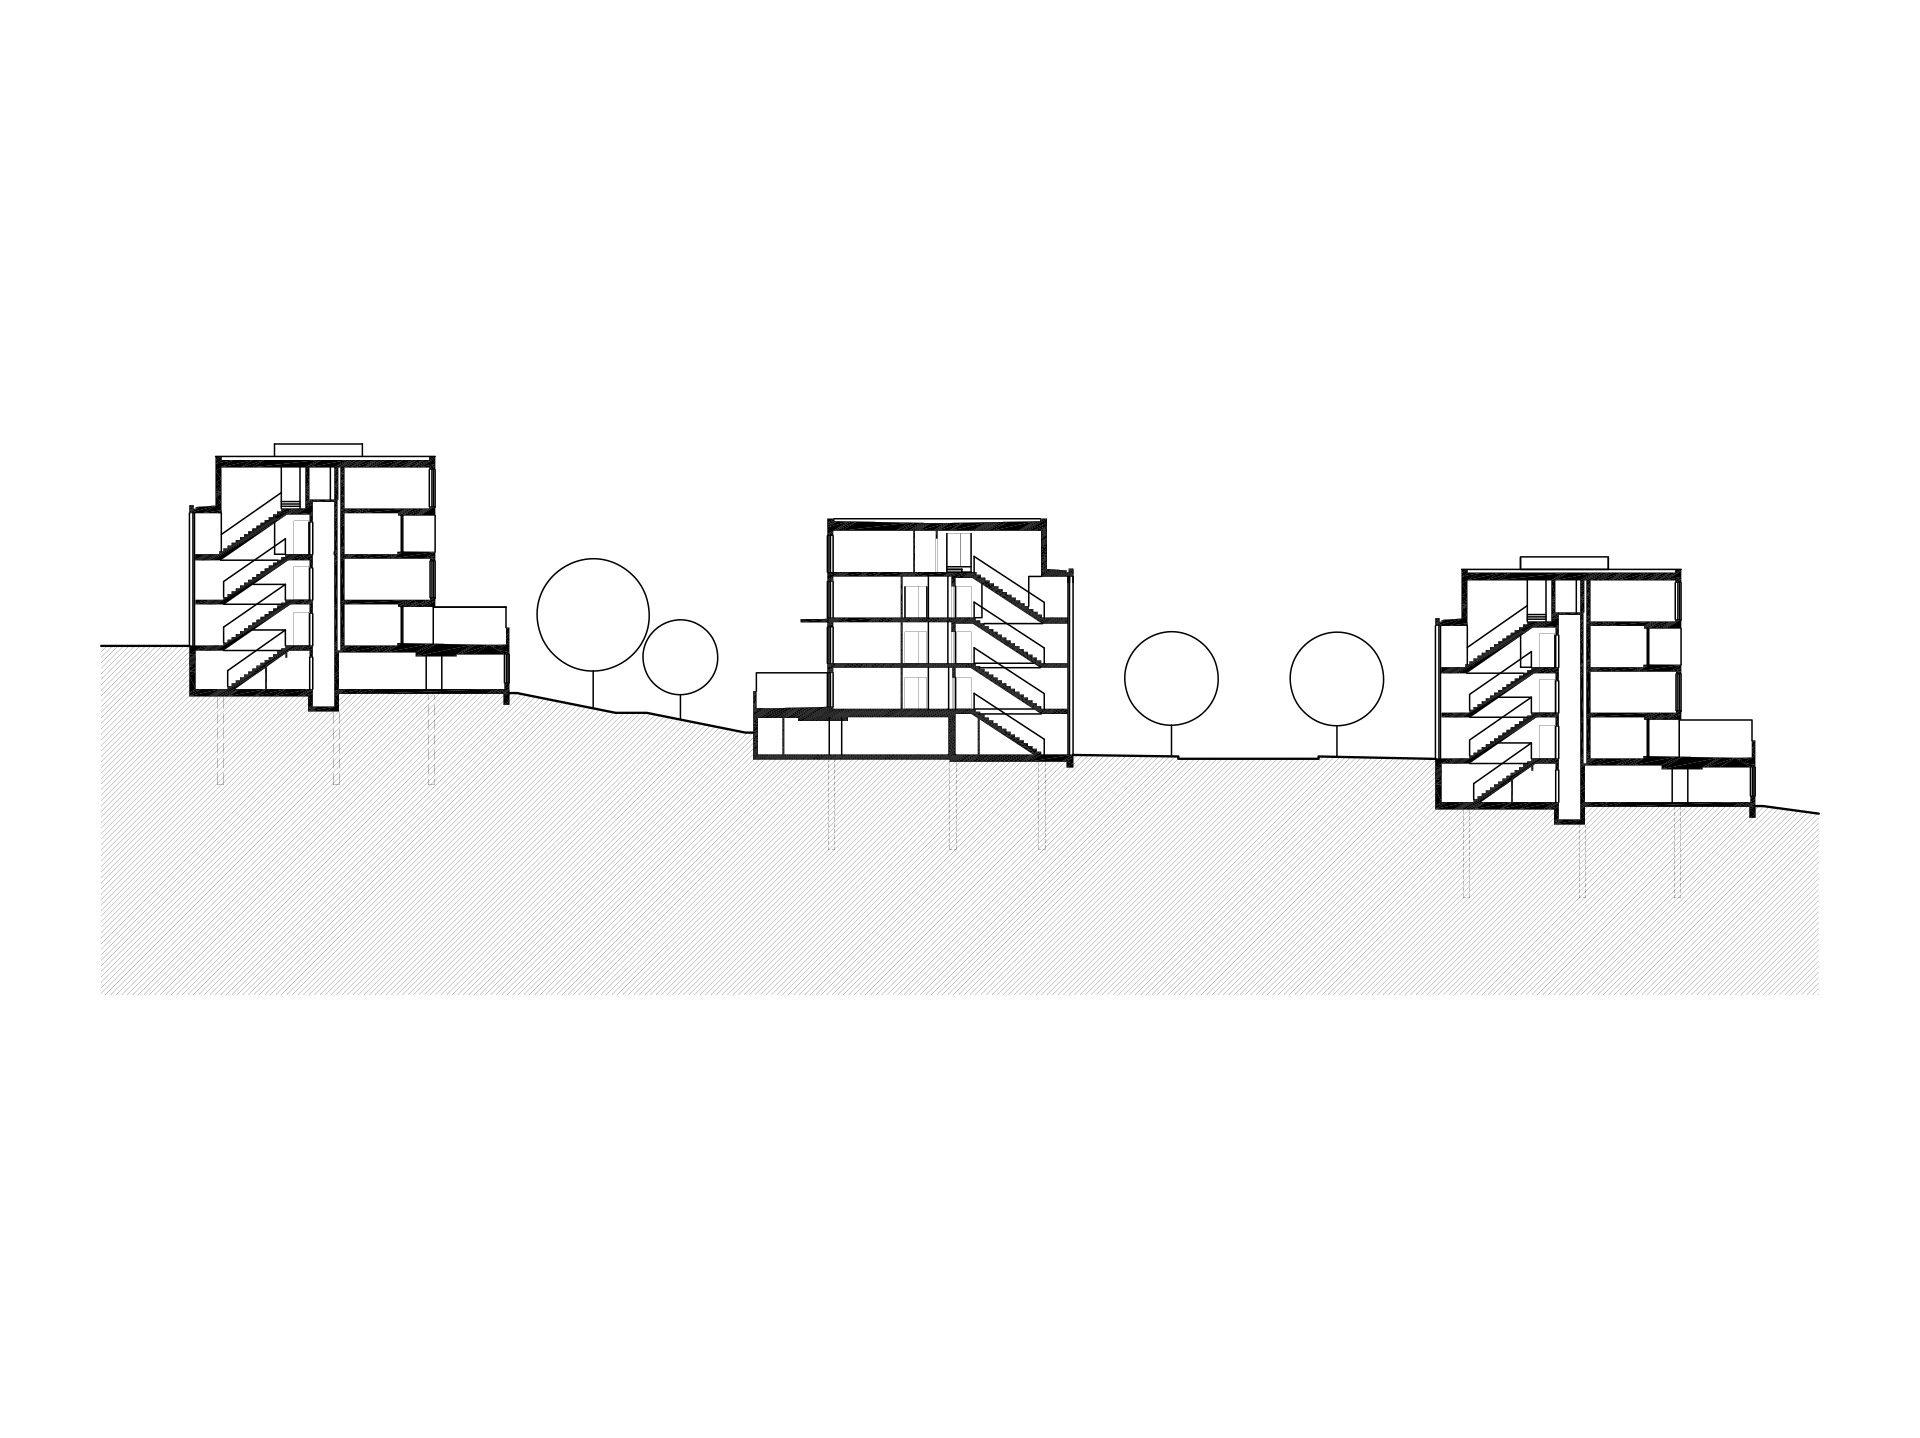 Obytný soubor Panorama I., Brno